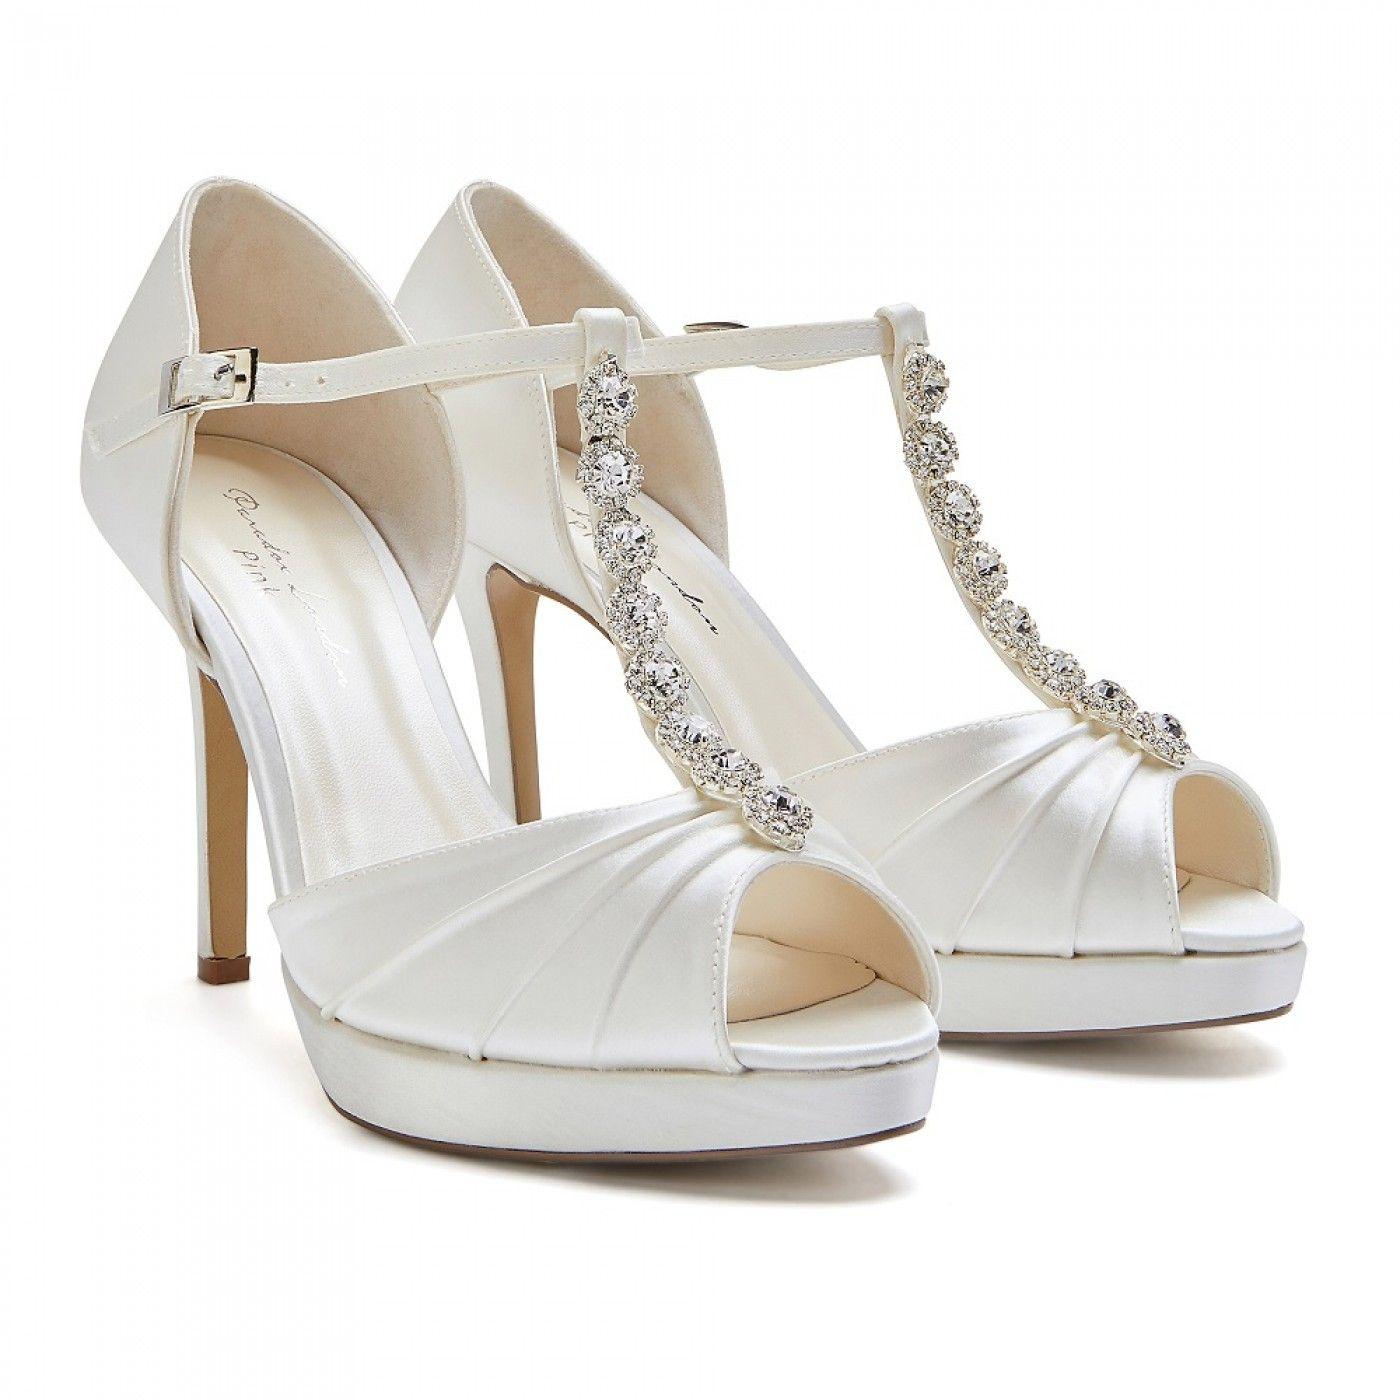 a04686774d7 Pink Paradox Cindy Ivory Satin High Heel Crystal T-Bar Platform ...